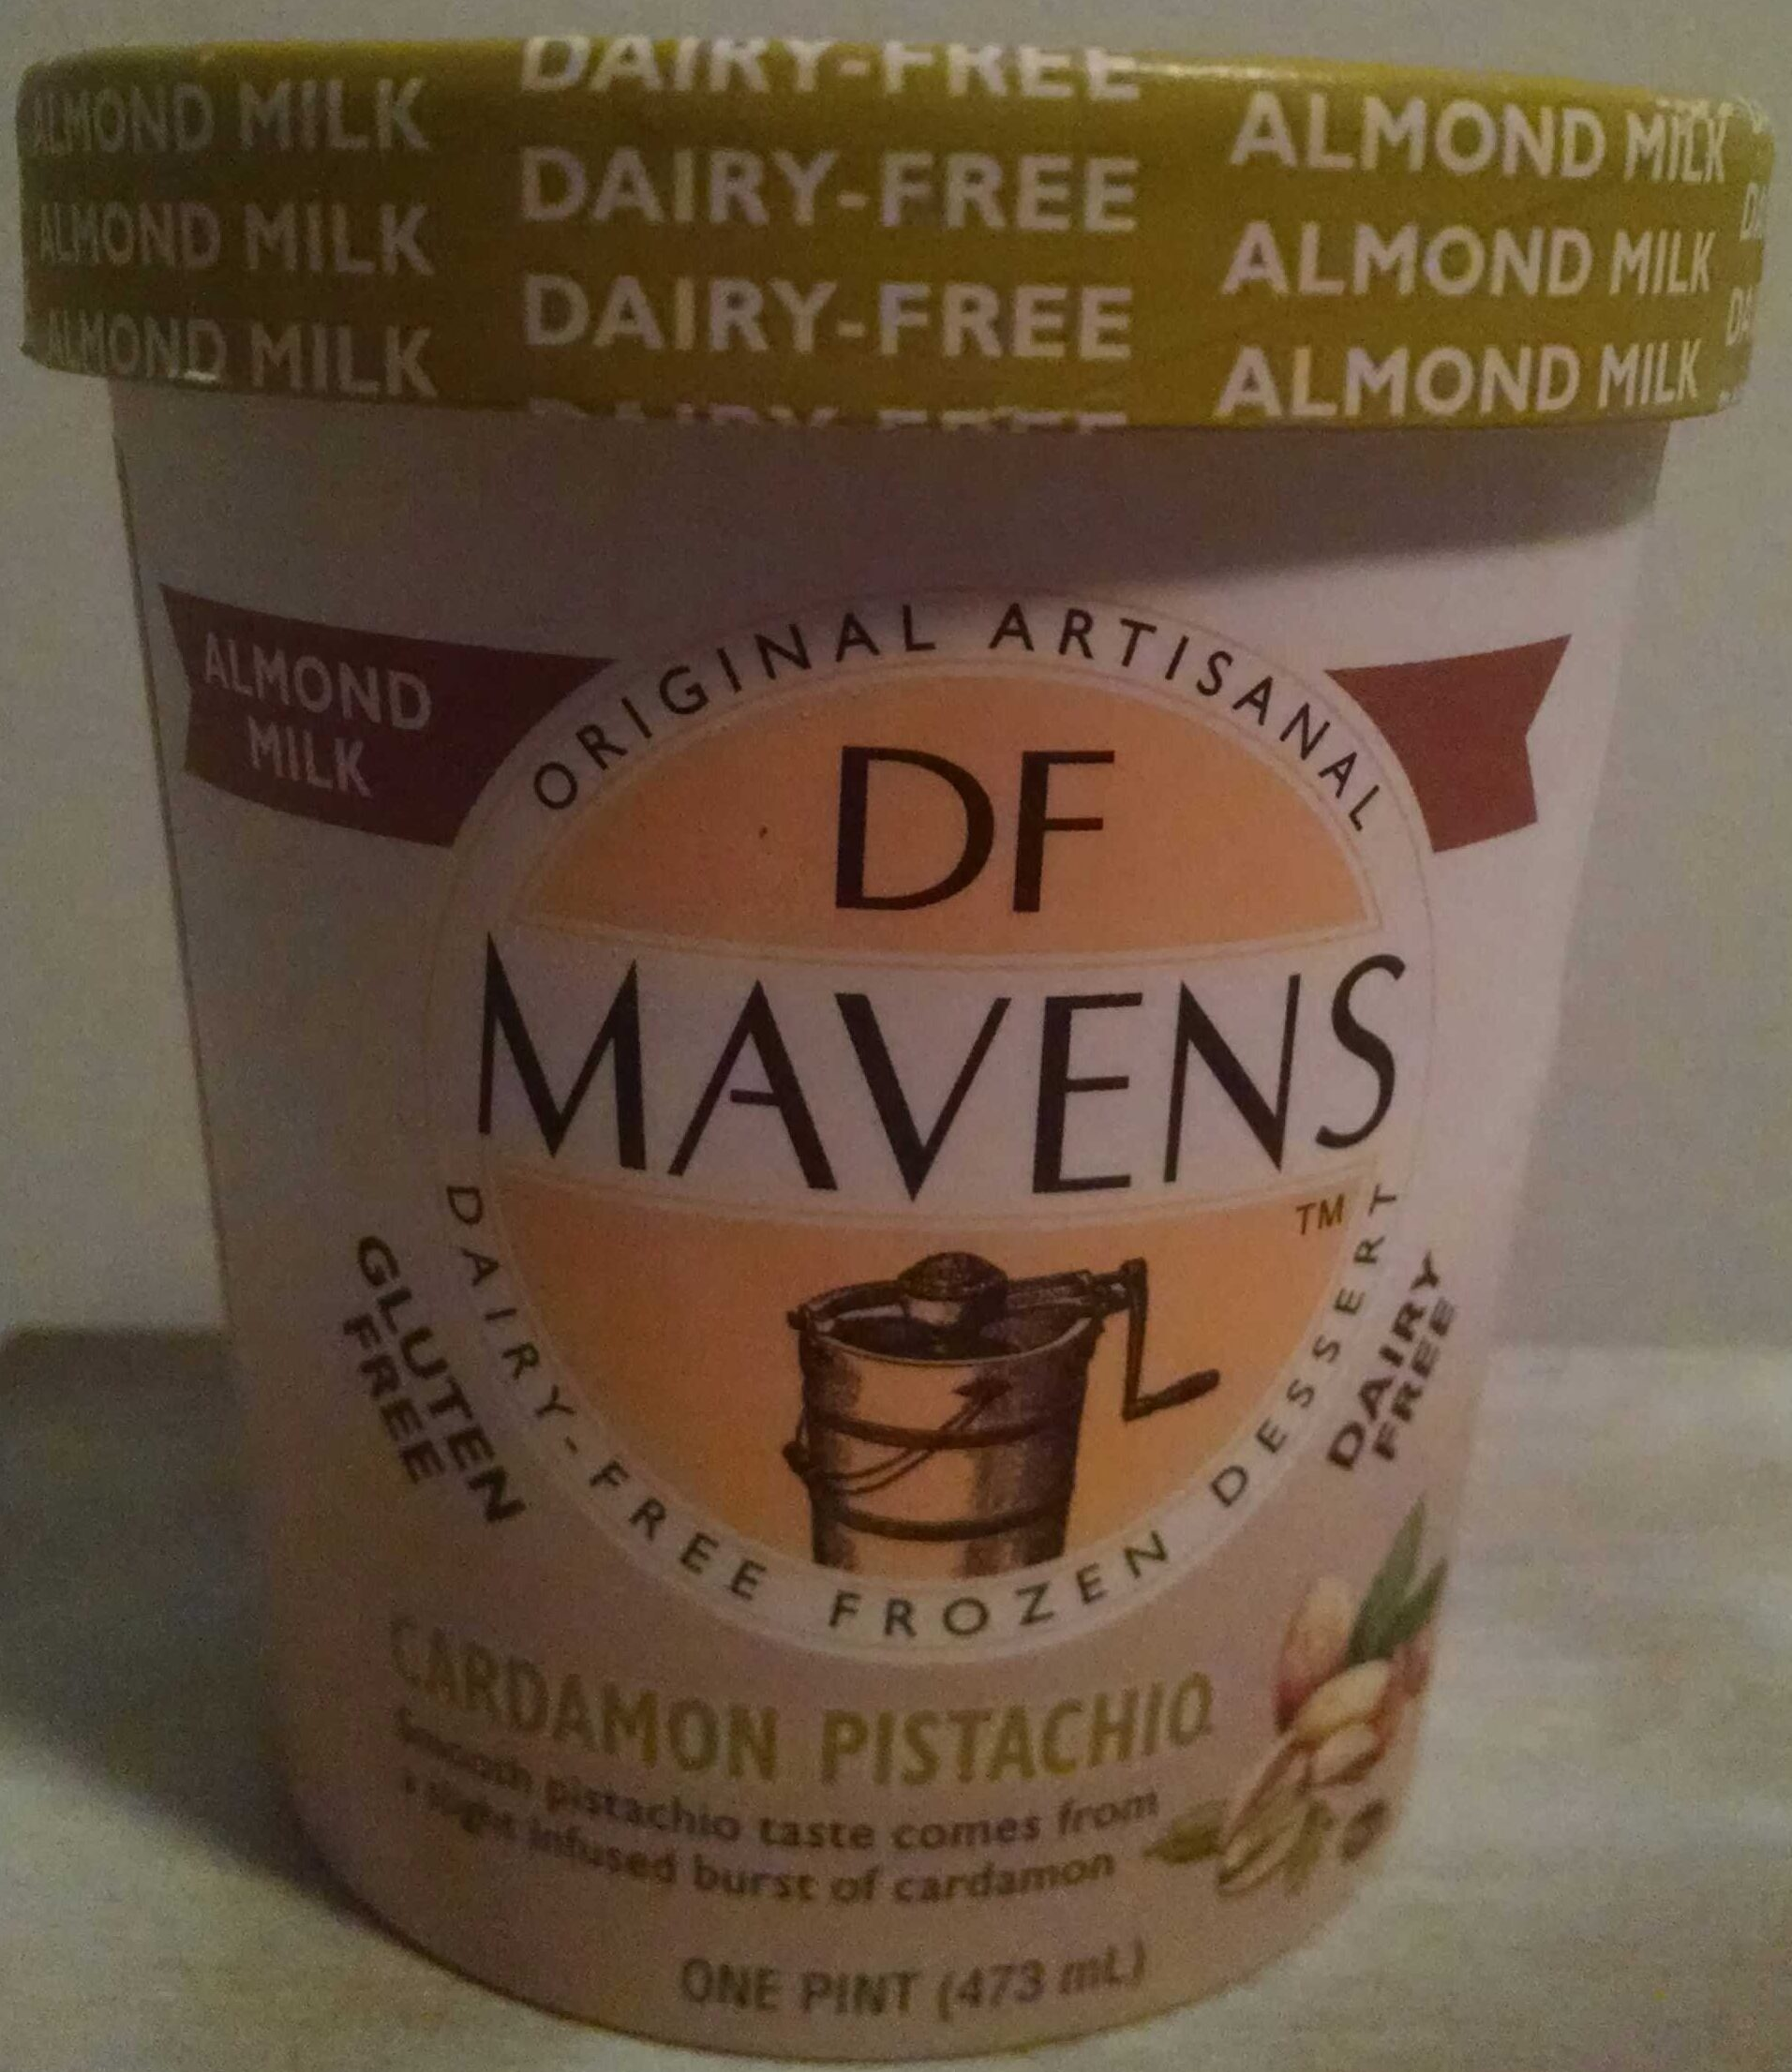 Dairy-Free Frozen Dessert, Cardamon Pistachio - Product - en